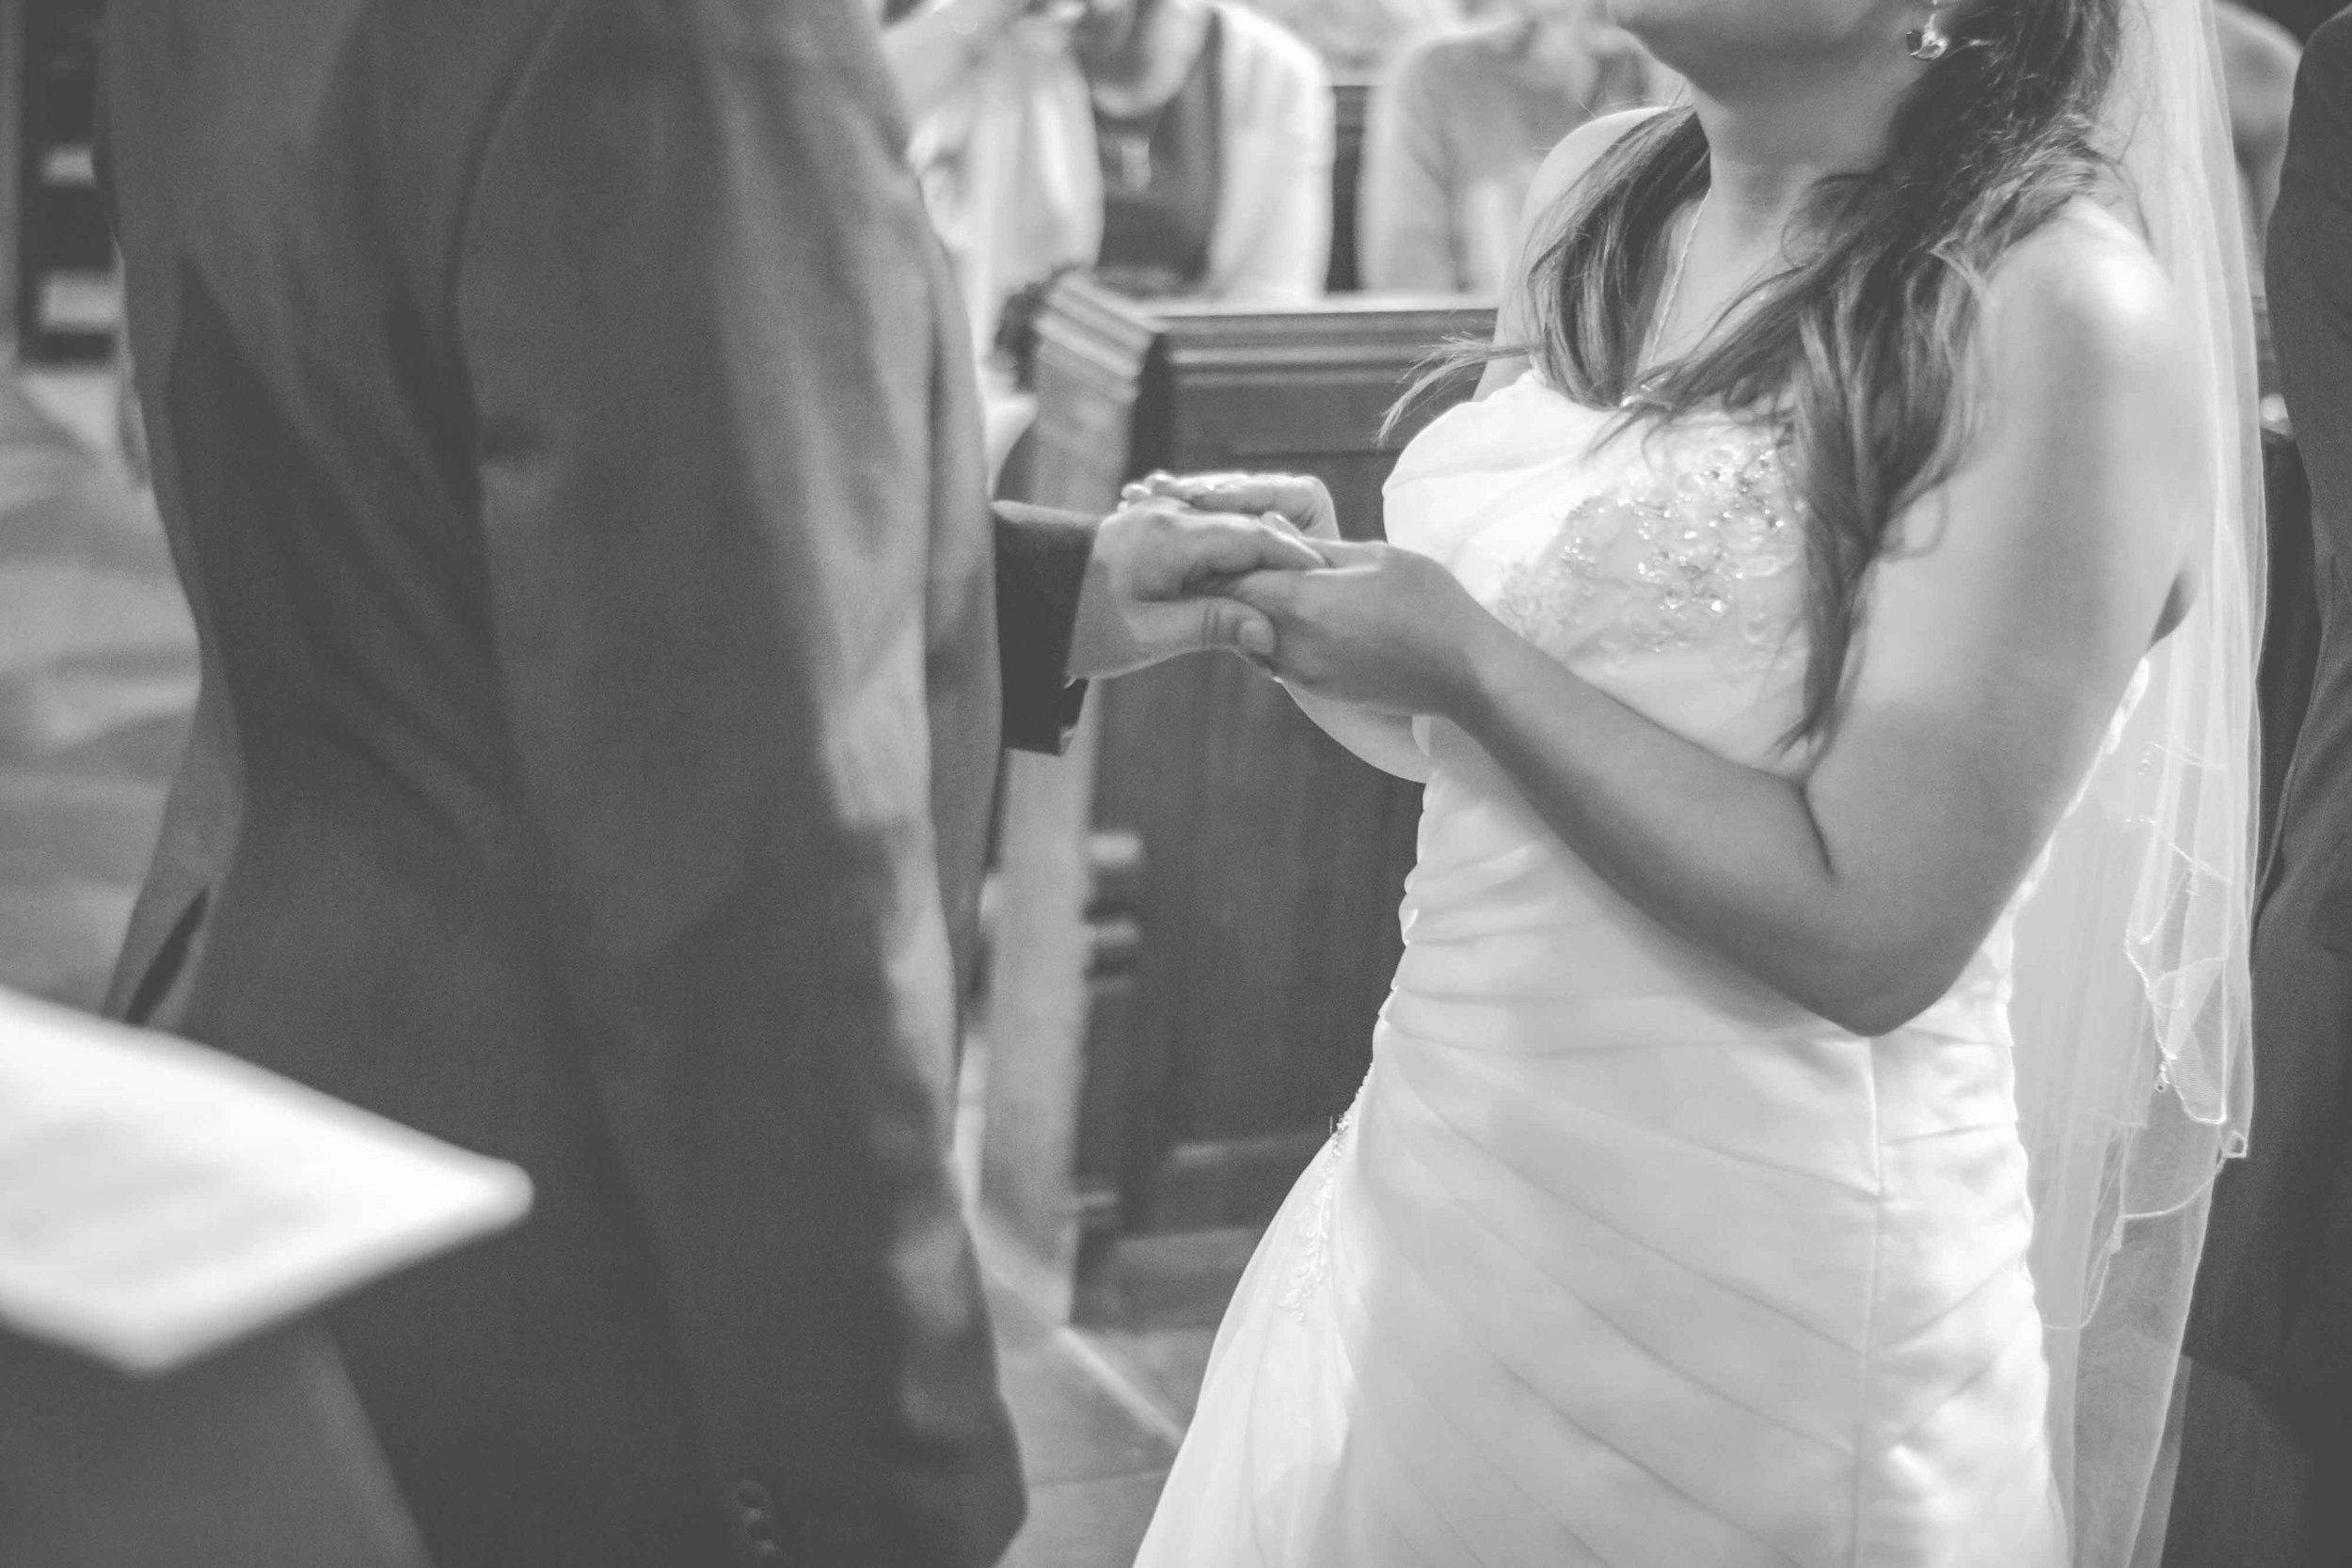 st-johns-ingrow-keighley-wedding-photos-16